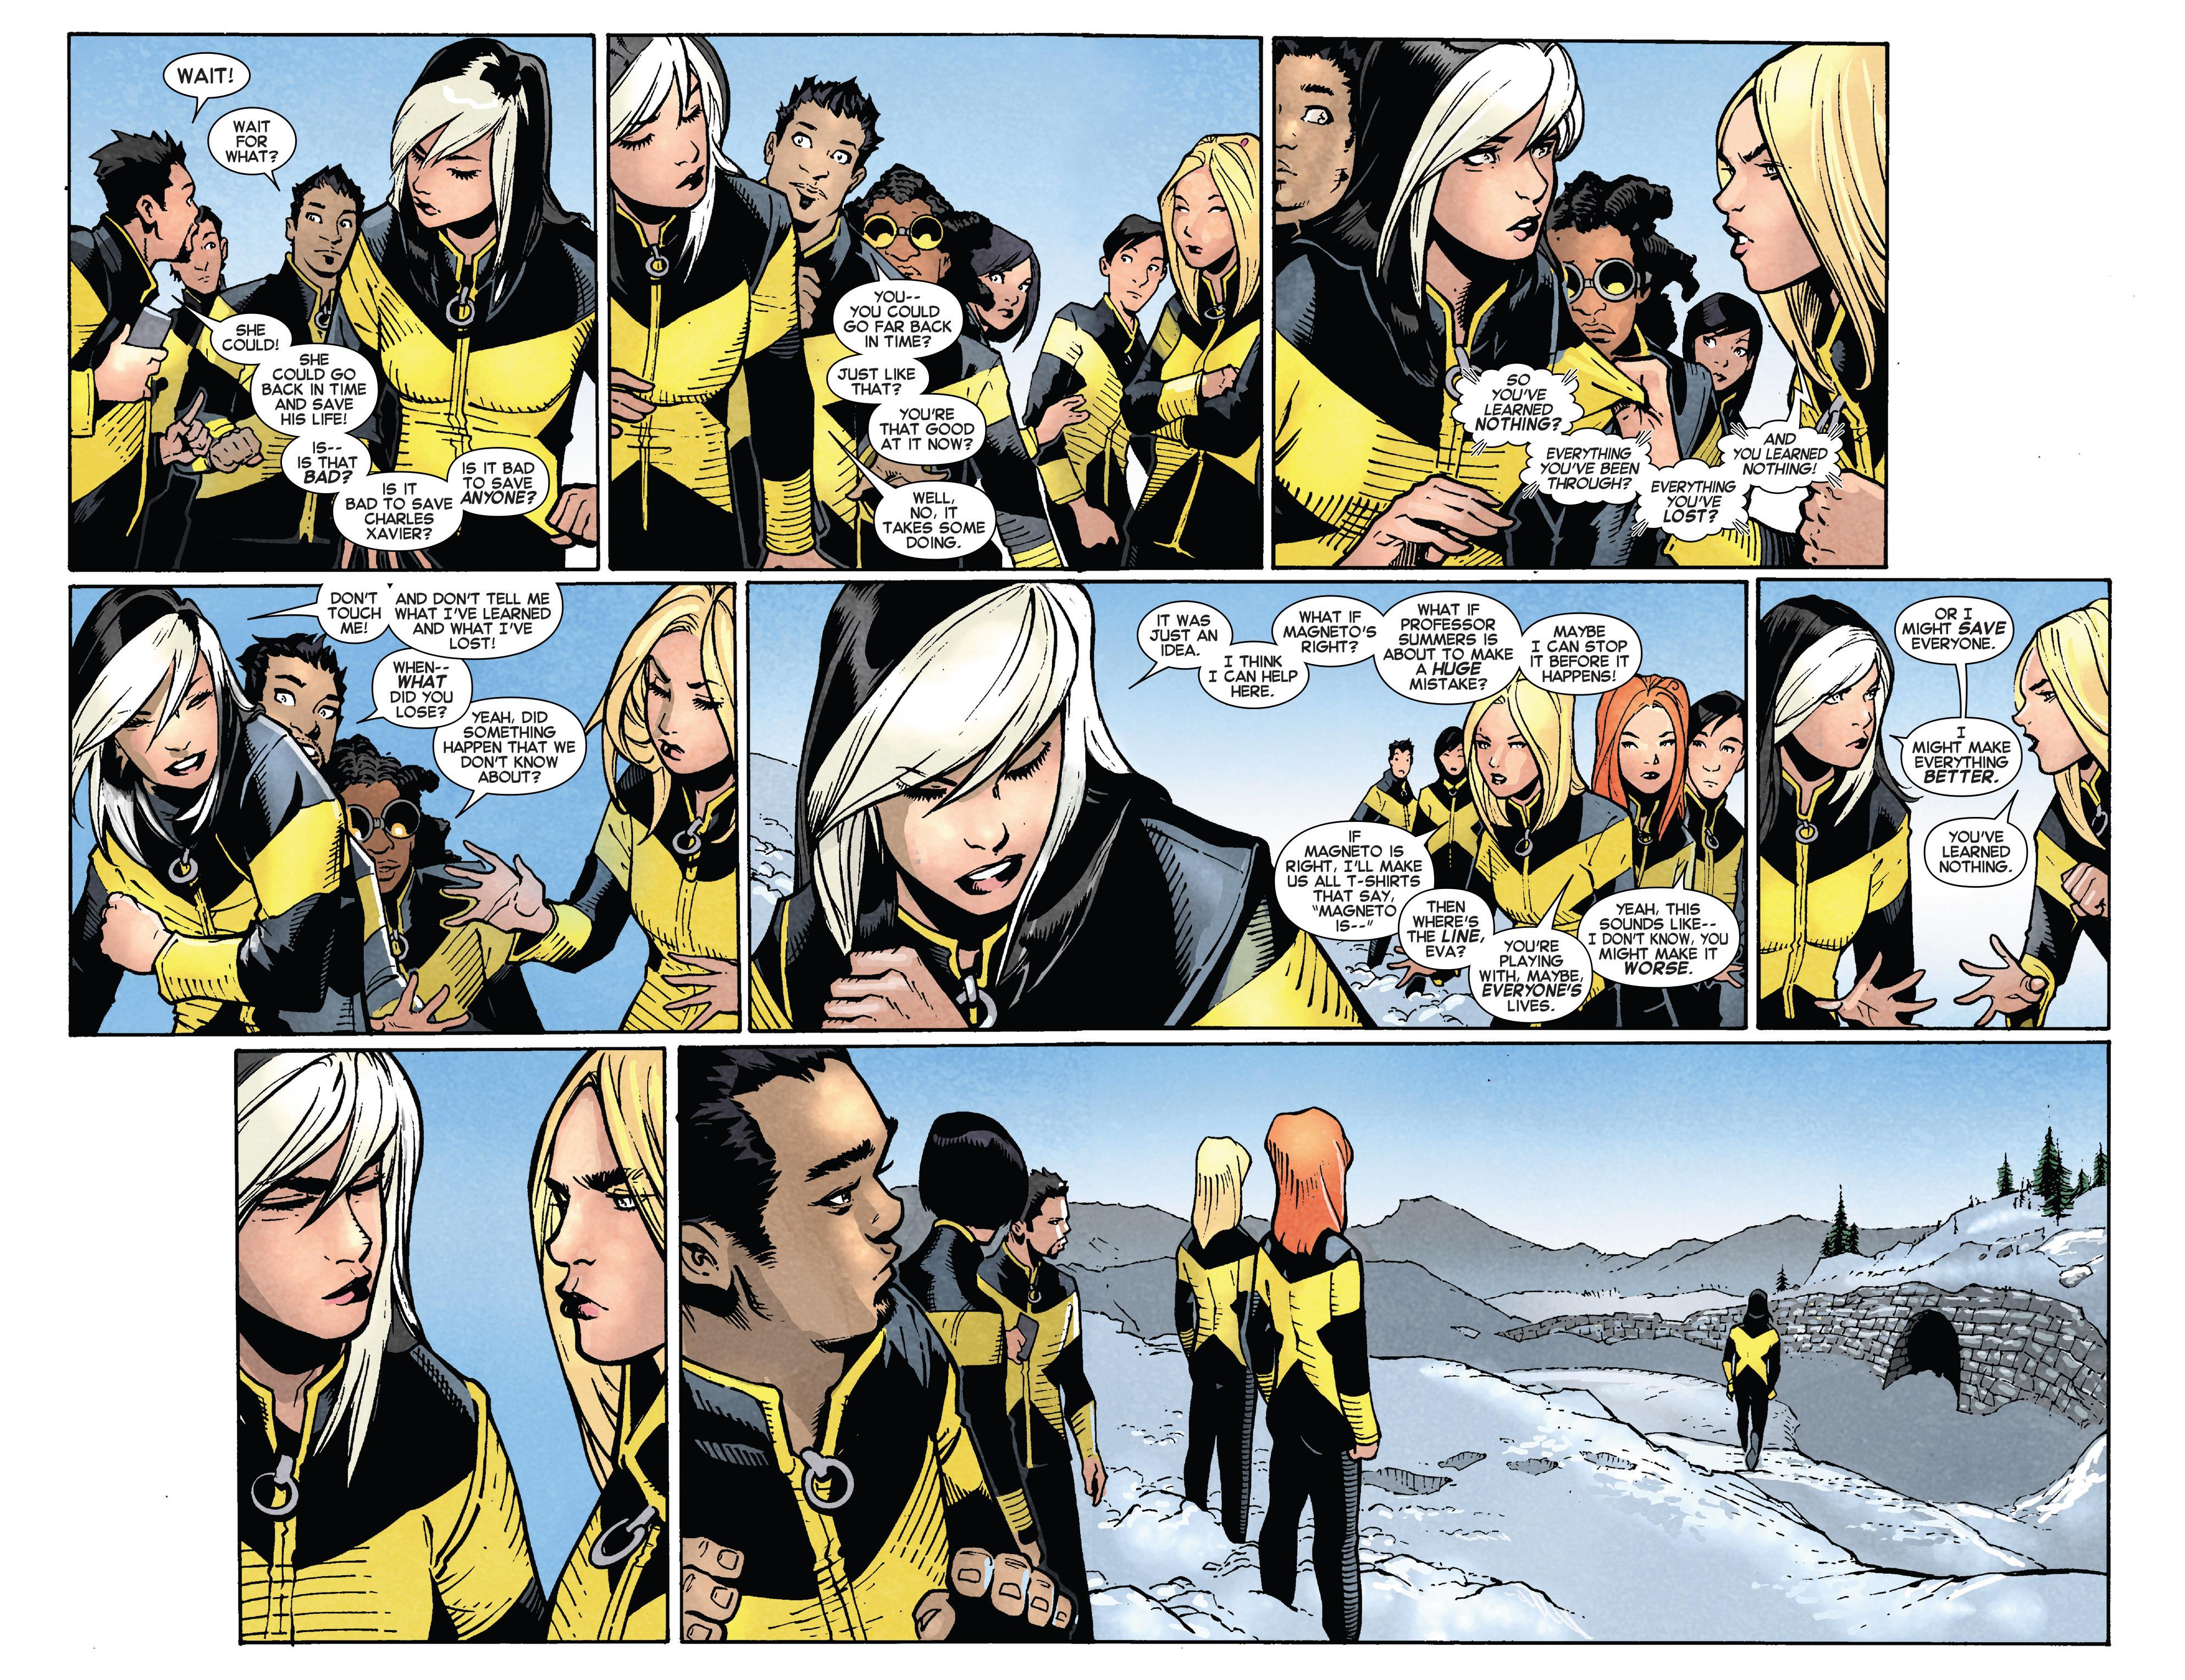 Read online Uncanny X-Men (2013) comic -  Issue # _TPB 5 - The Omega Mutant - 68